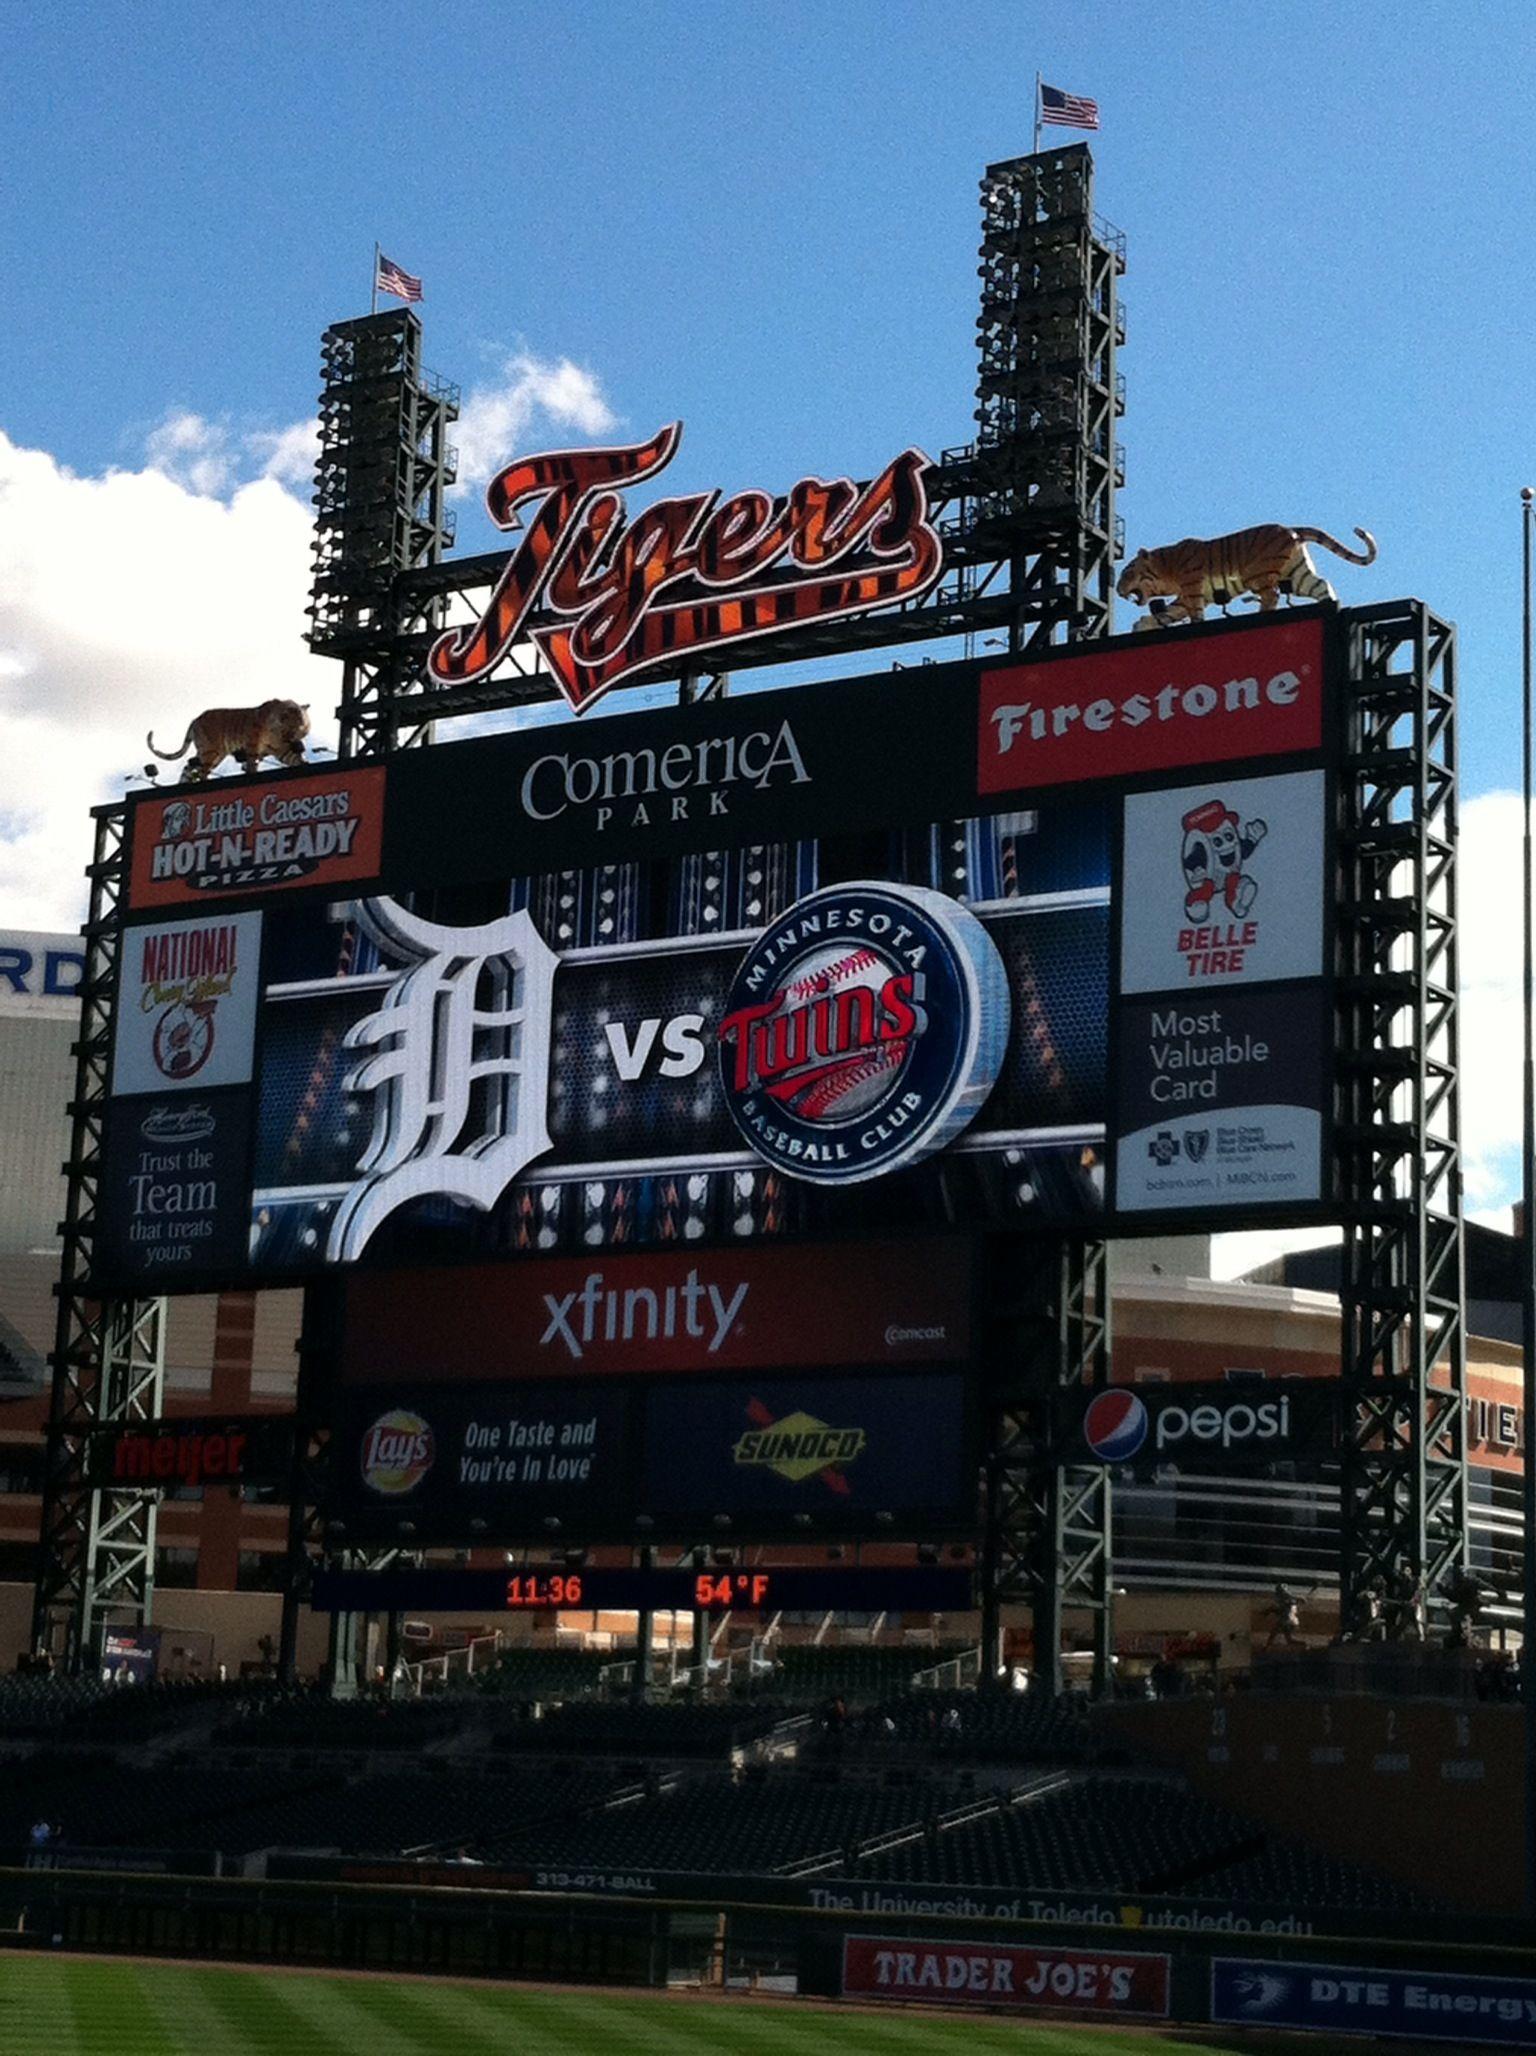 Pin de Diane en Detroit Tigers | Pinterest